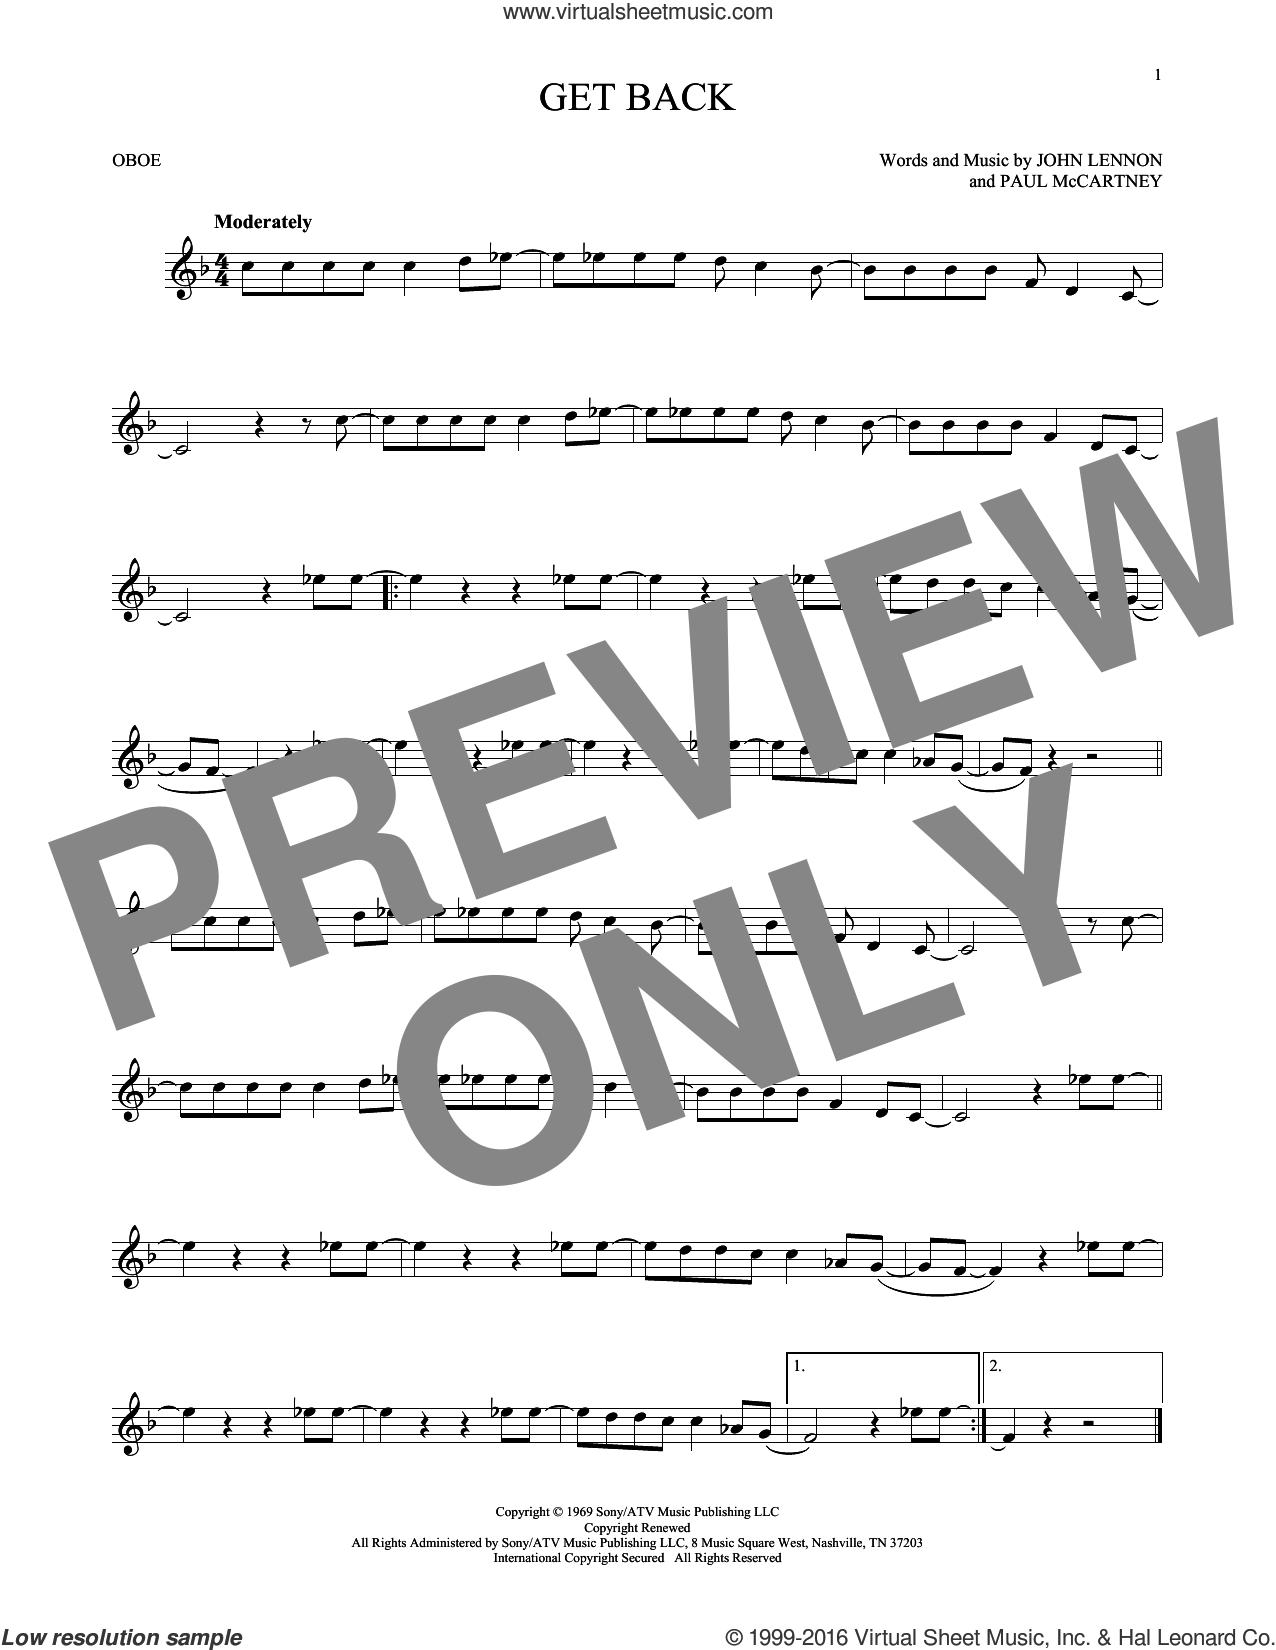 Get Back sheet music for oboe solo by The Beatles, John Lennon and Paul McCartney, intermediate skill level